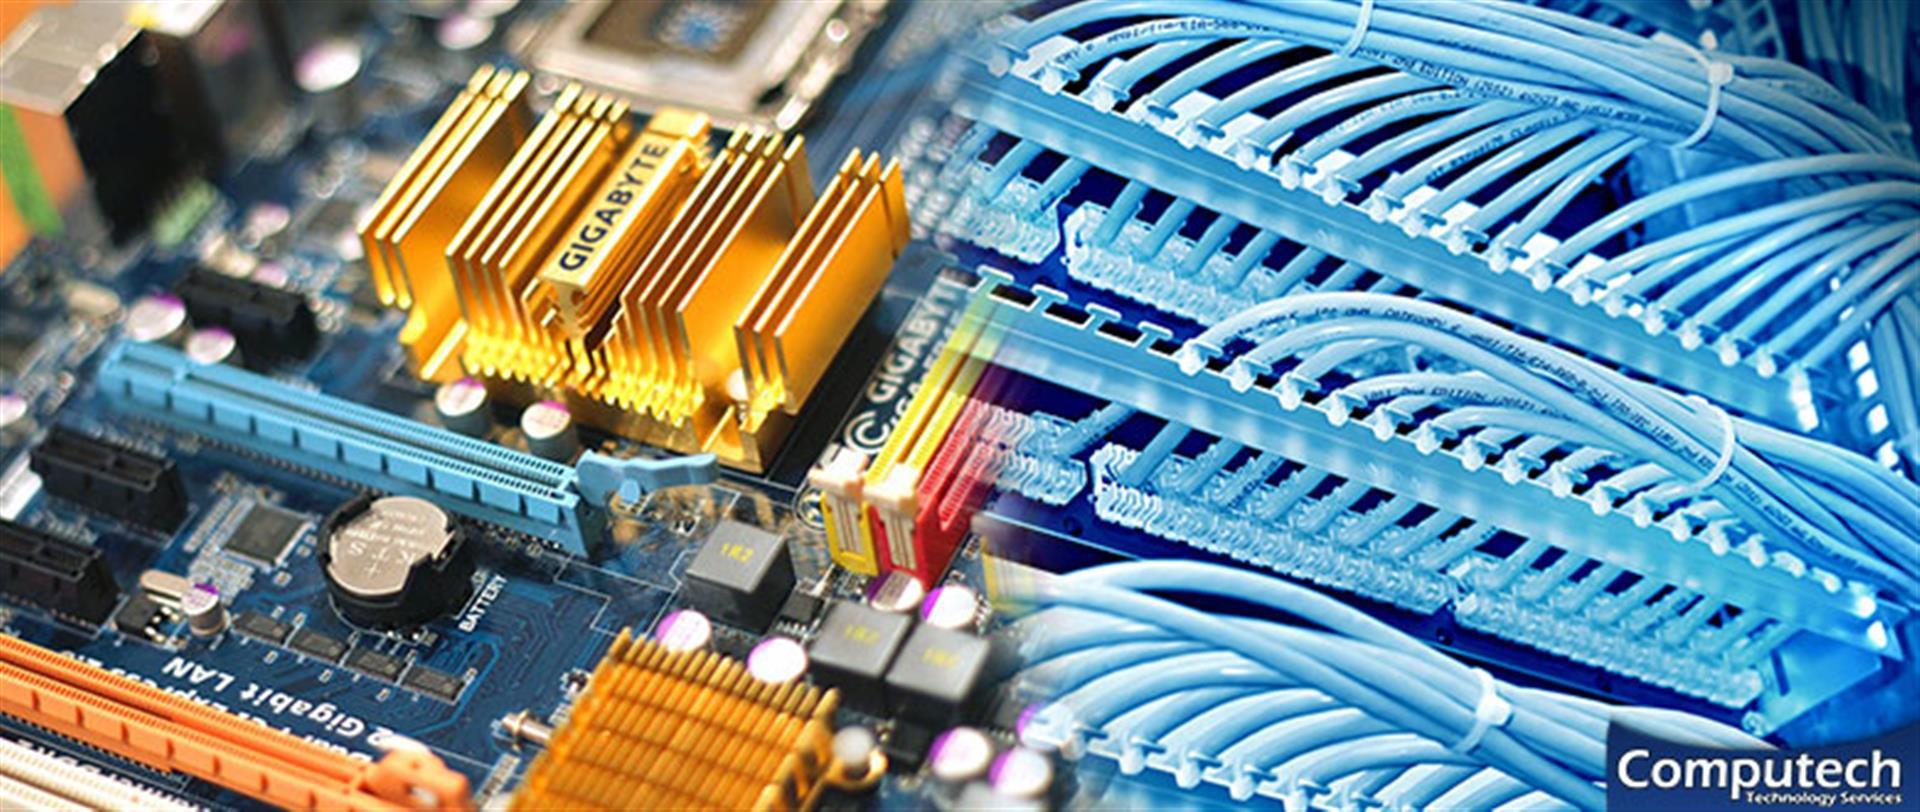 Auburn Alabama On Site PC & Printer Repair, Networking, Telecom & Data Cabling Solutions